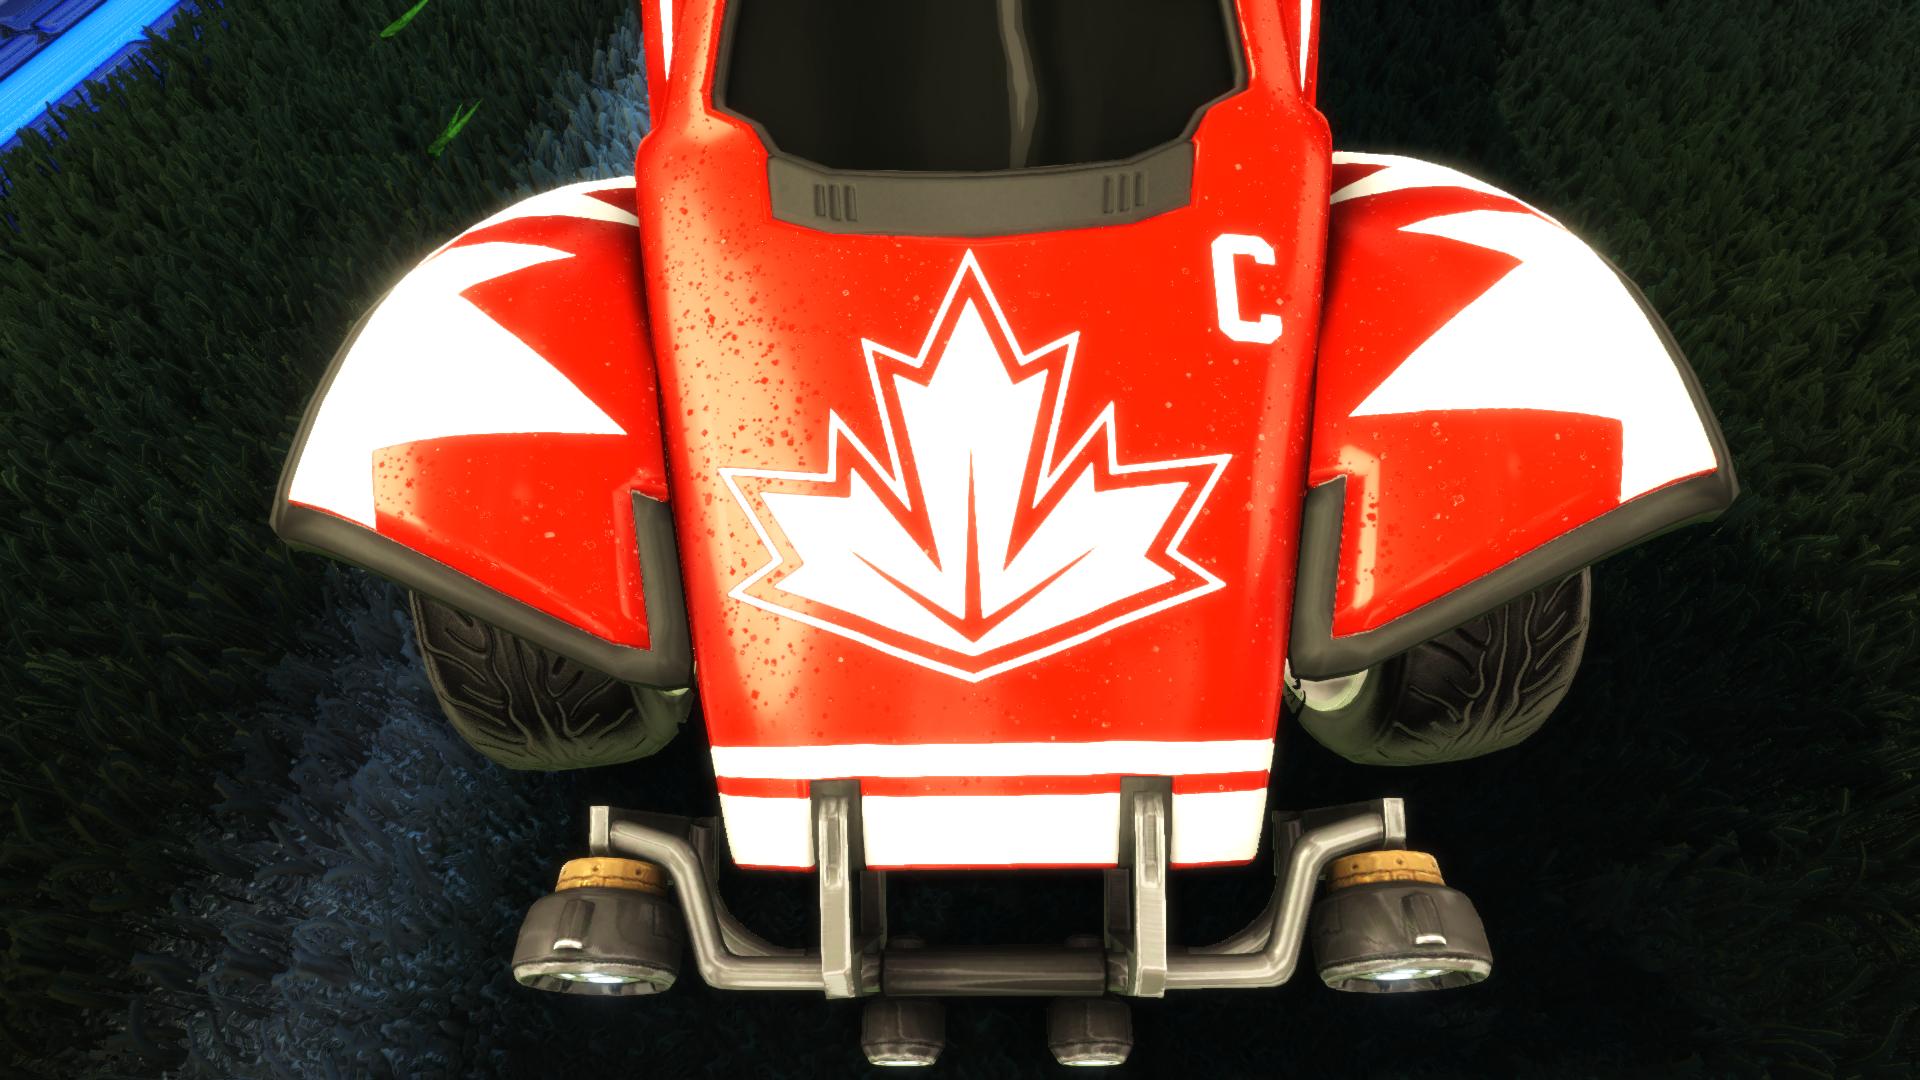 Team Canada Octane Decal